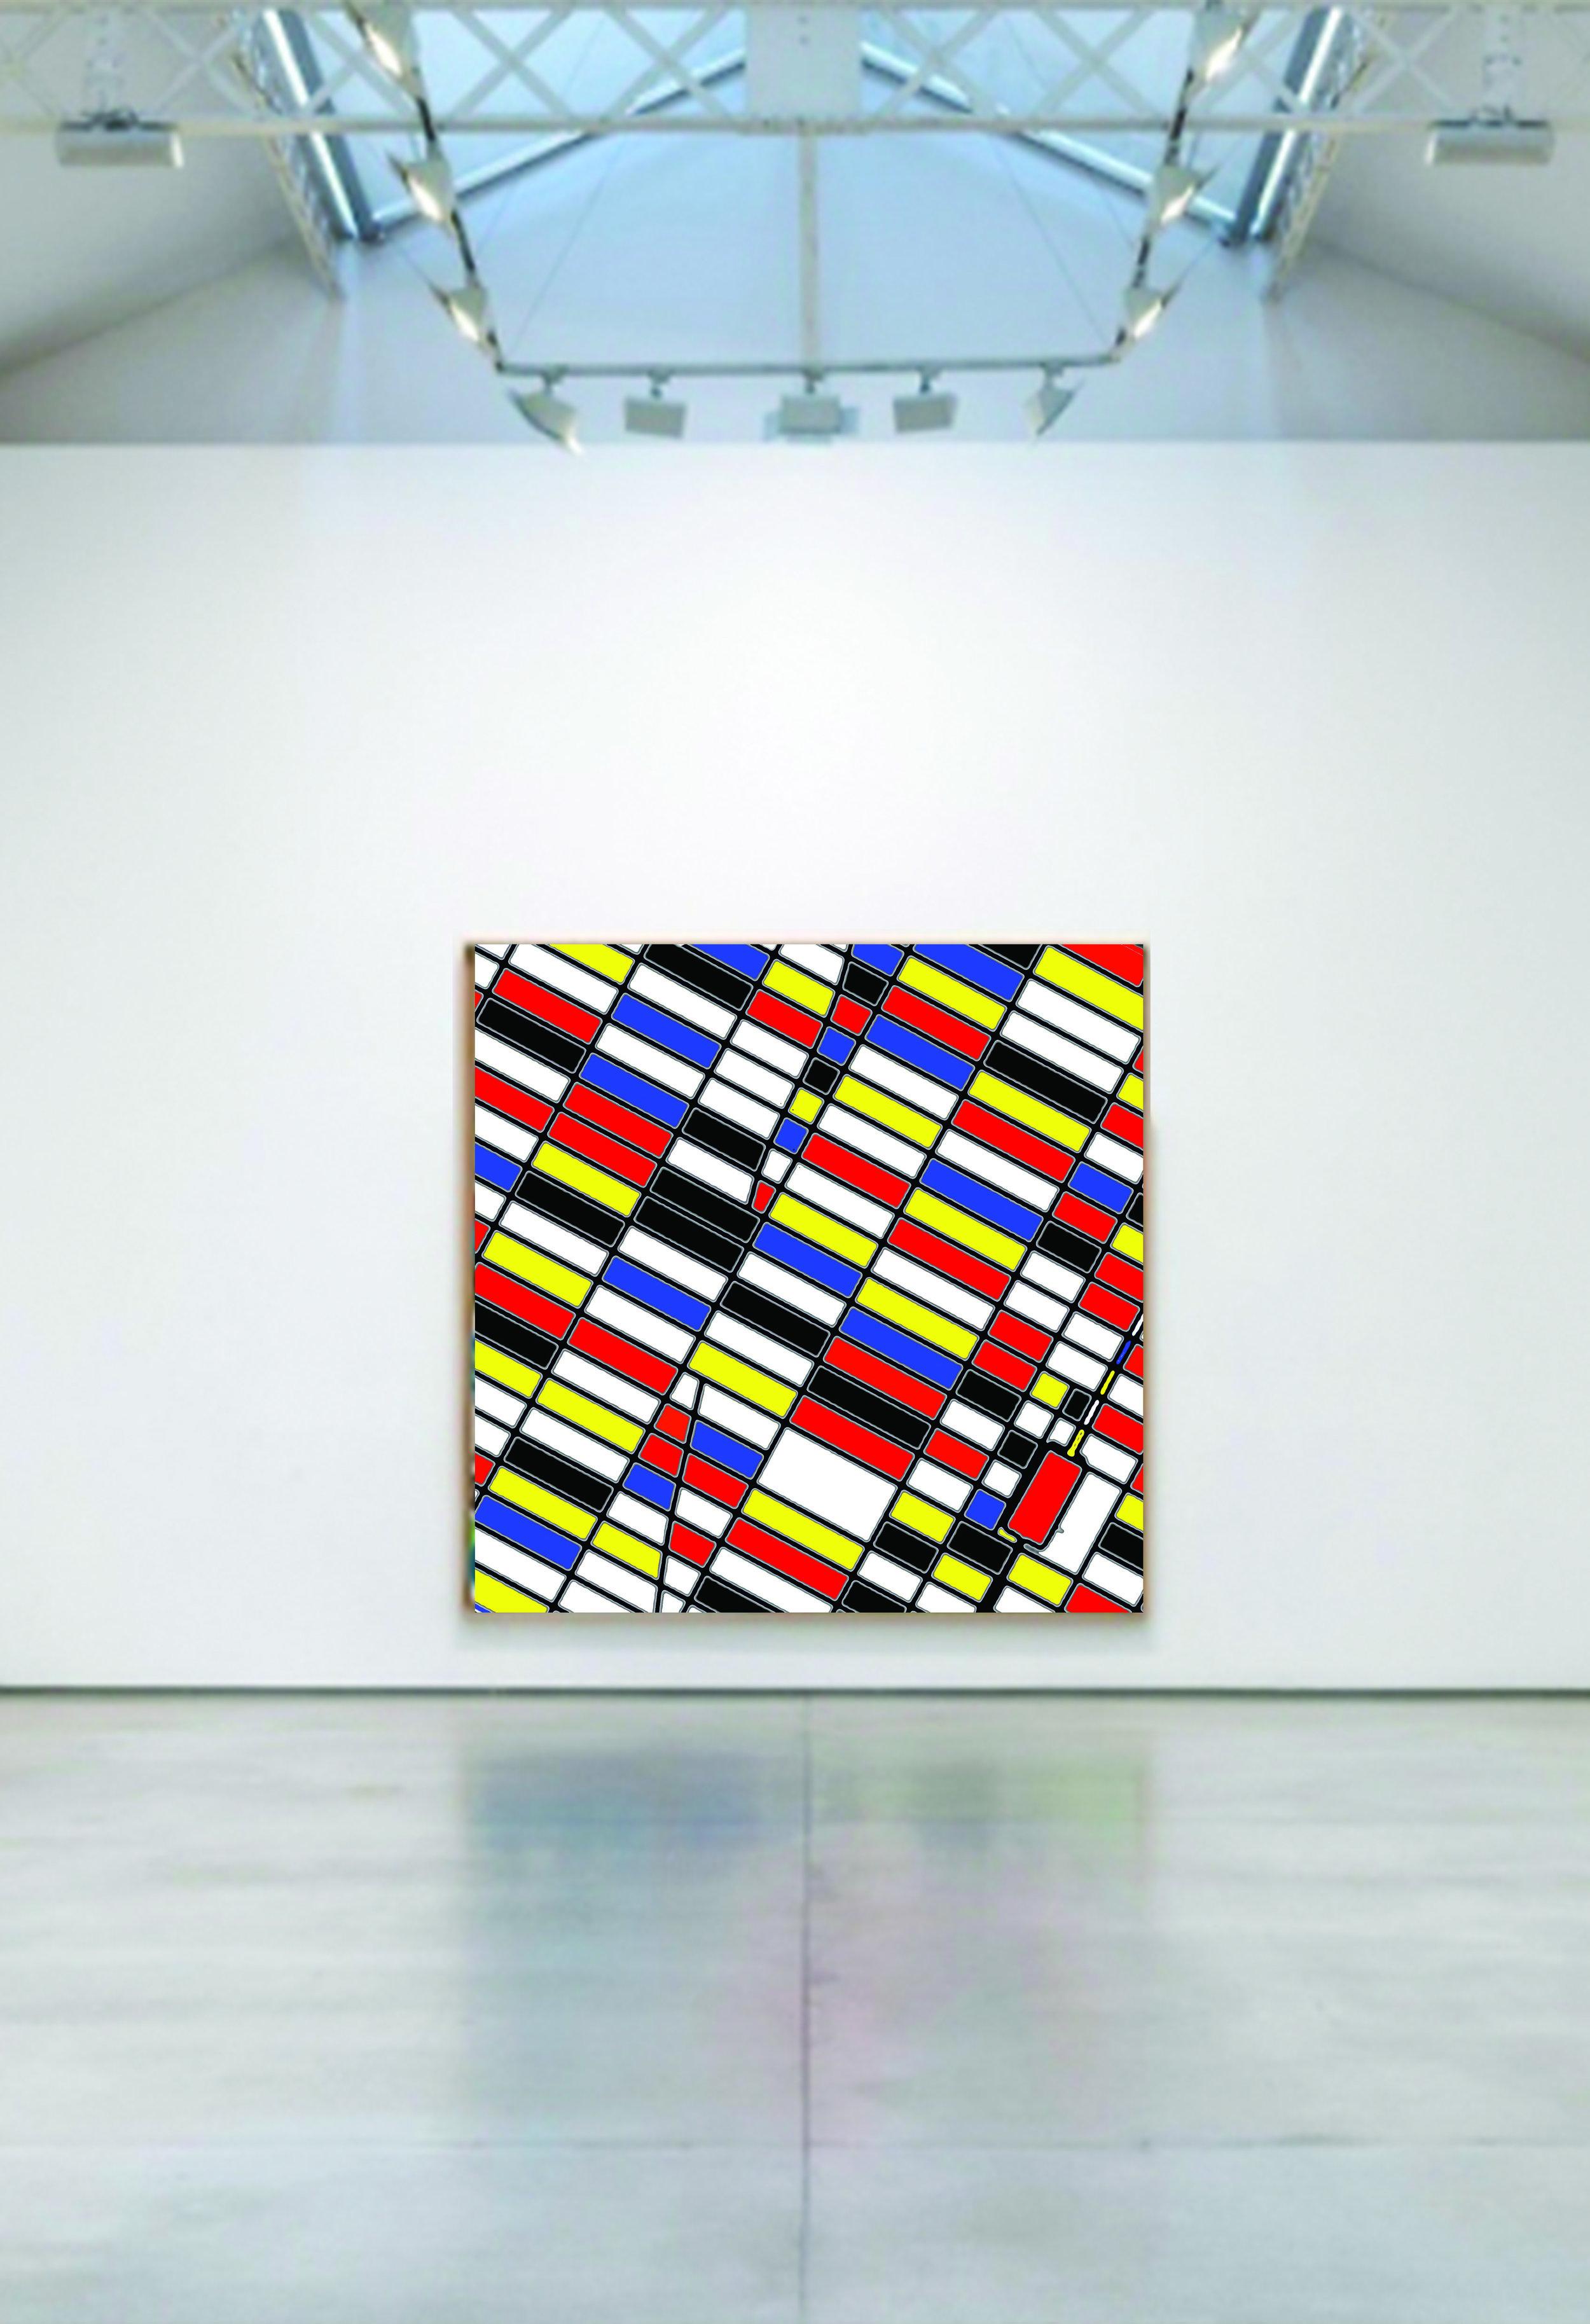 "96"" x 96"" x 2.5"" NYC?Mondrian frame"